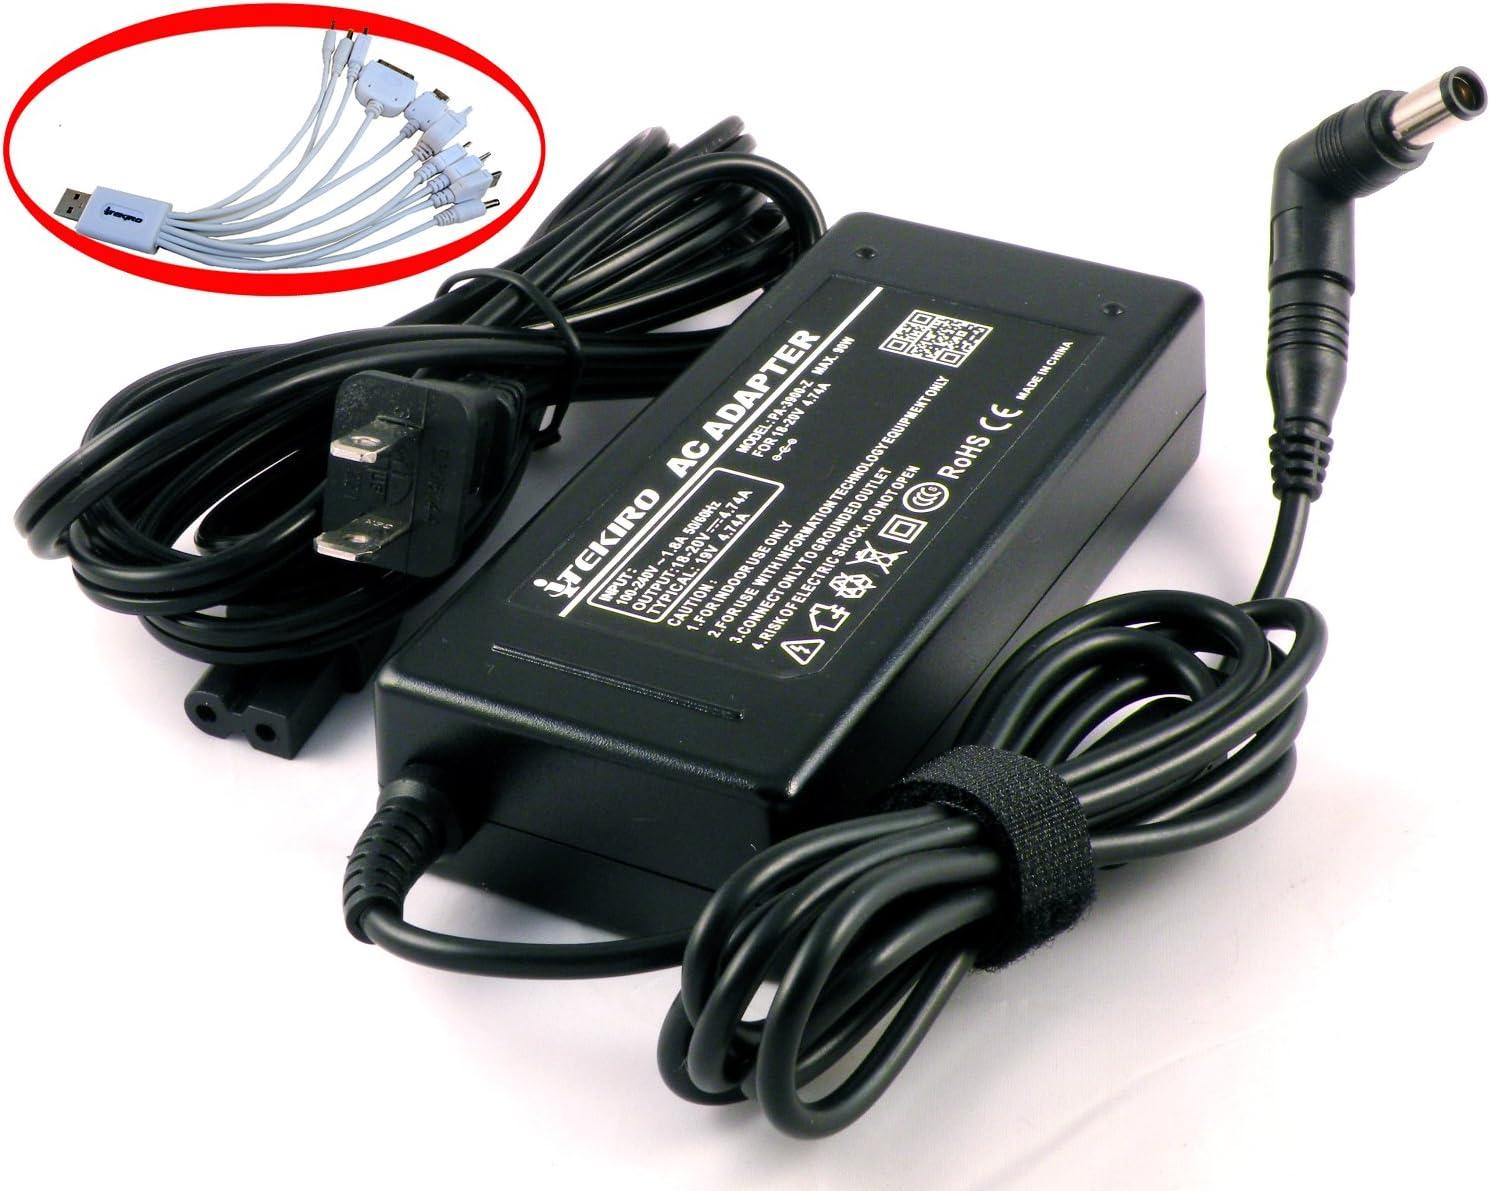 iTEKIRO Laptop AC Power Adapter Notebook Charger for HP Pavilion dv6t-1100 dv6t-7000 dv6z dv6z-1000 dv7-6163us dv7-6178us dv7-7012nr dv7-6b32us dv7-6b55dx dv7-6b77dx dv7-6c23cl dv7-6c20us dv7-6c60us dv7-6c80us dv7-6c43cl dv7-6c95dx + iTEKIRO10-in-1 USB Charging Cable